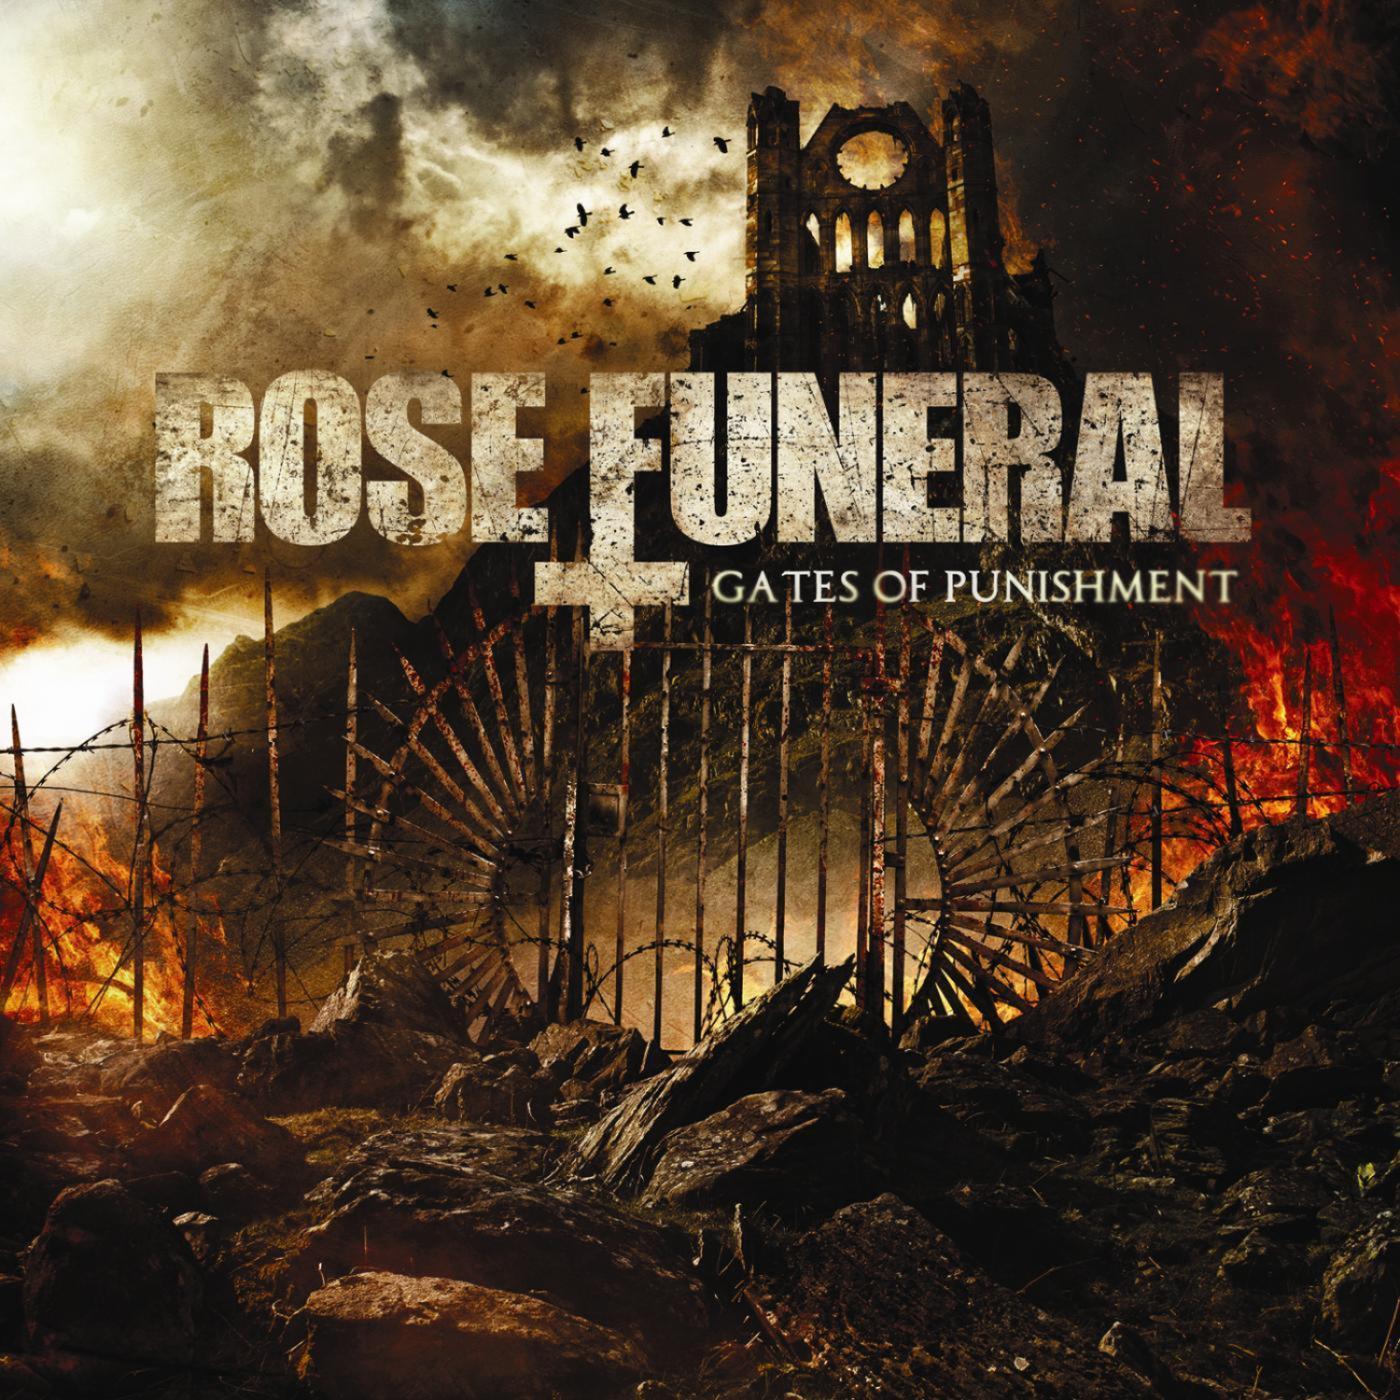 Rose Funeral - Gates Of Punishment (2011)